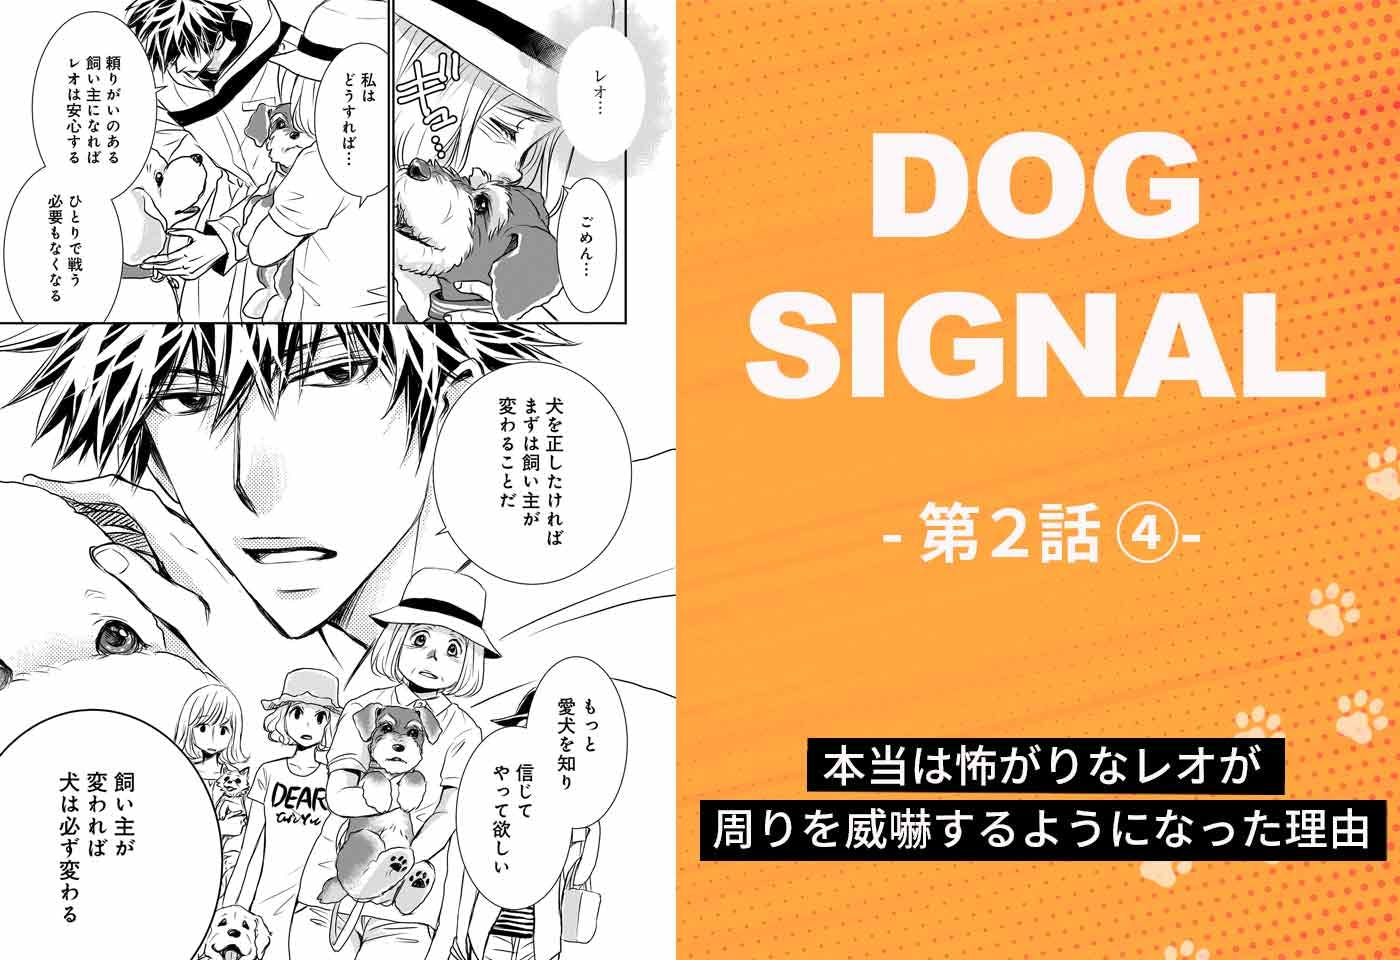 『DOG SIGNAL』2話目 4/4